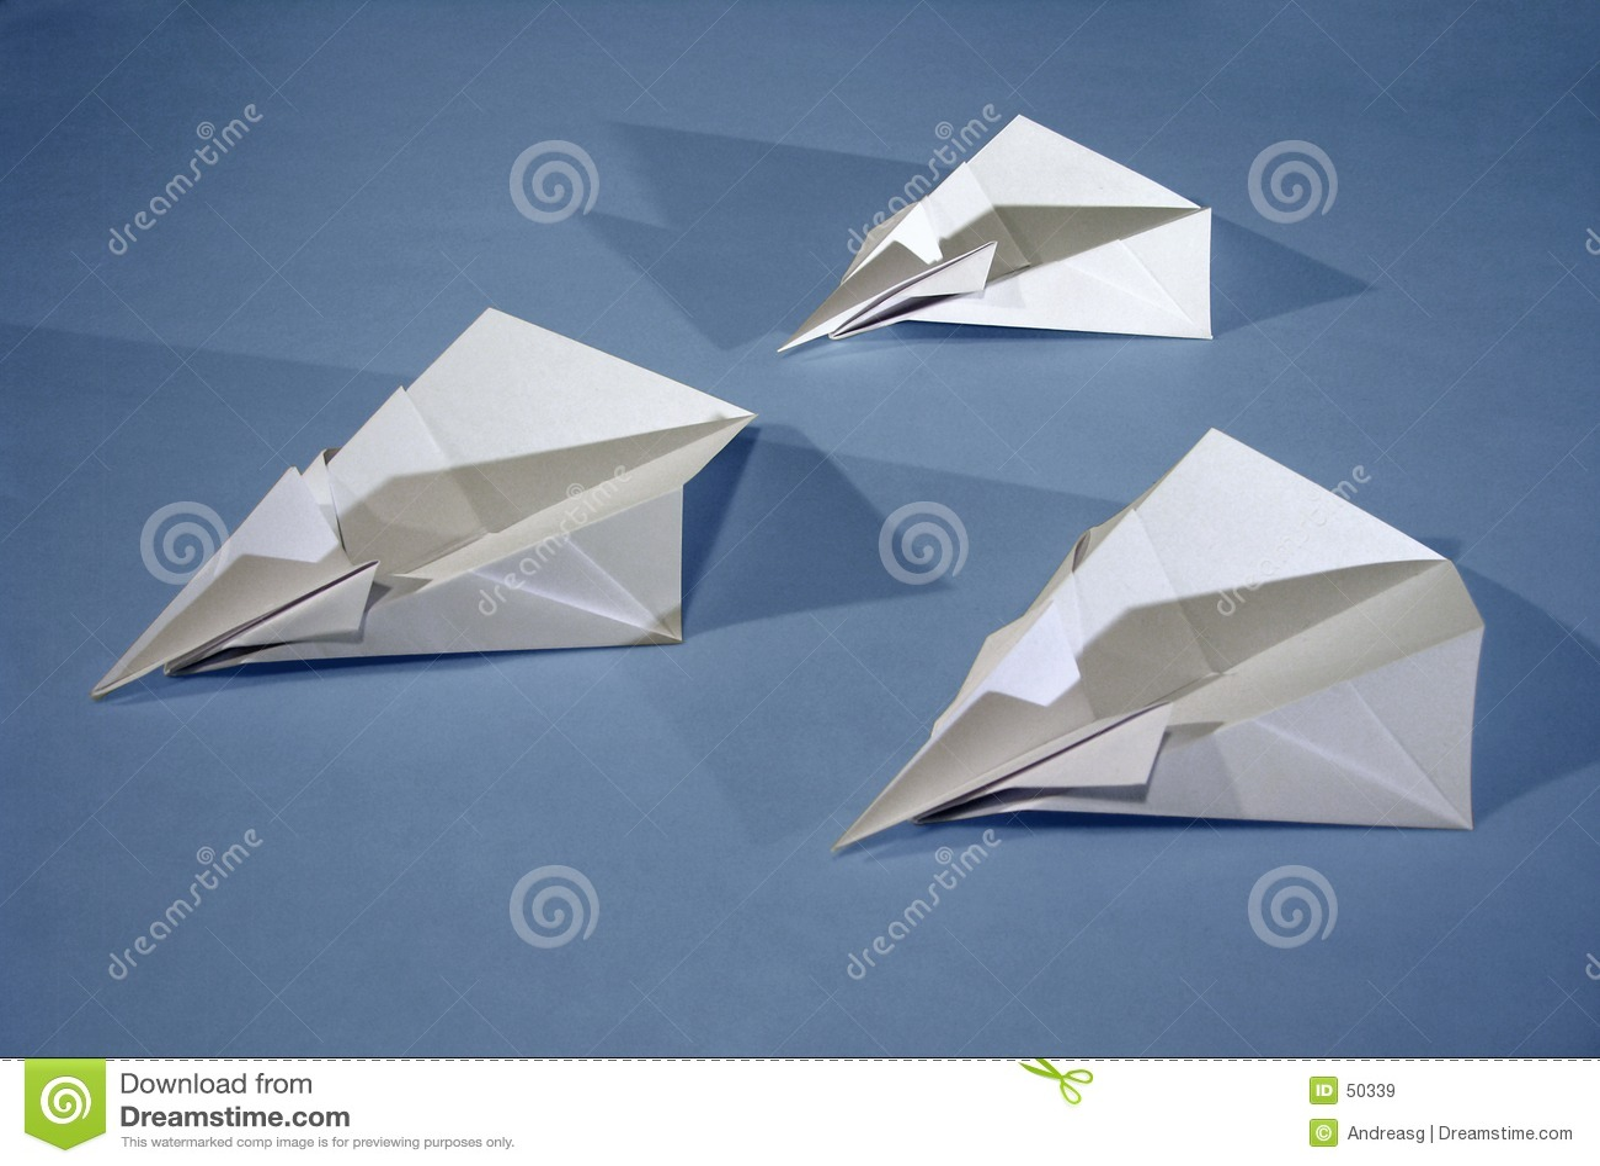 3 Papierflugzeuge